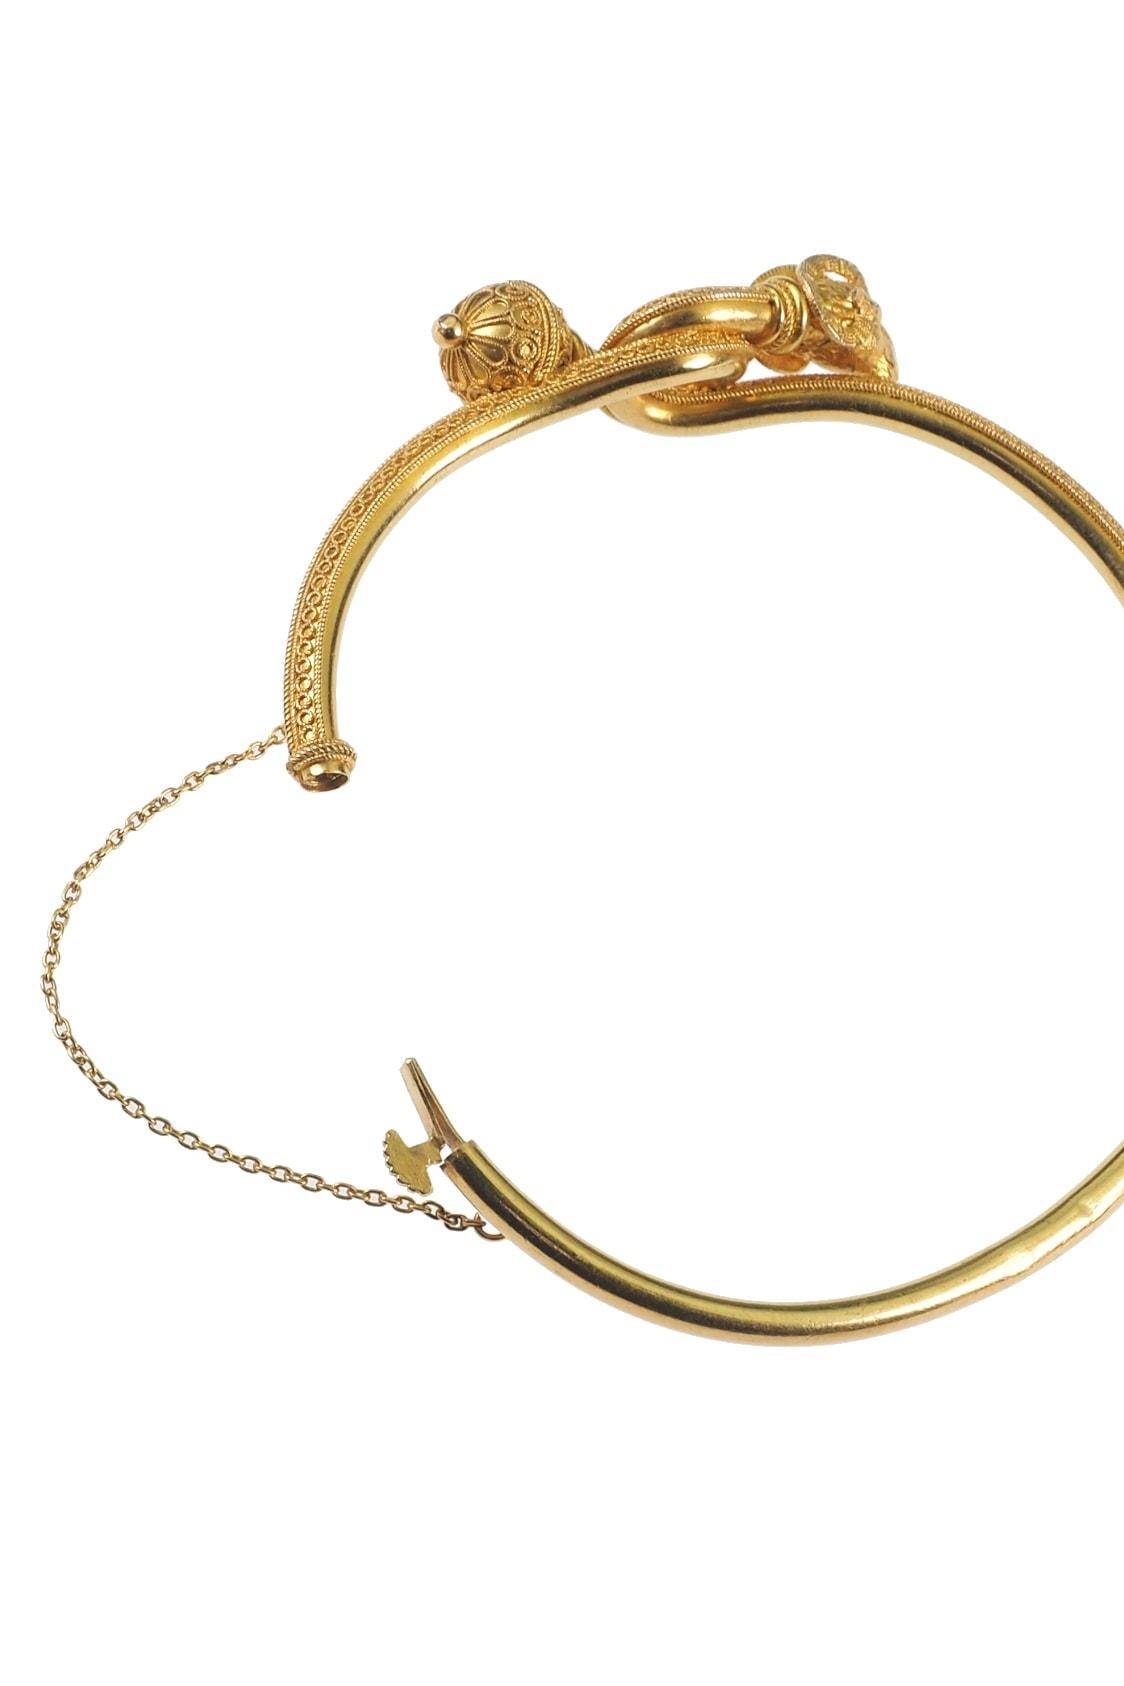 antike-Goldarmreifen-kaufen-2462d